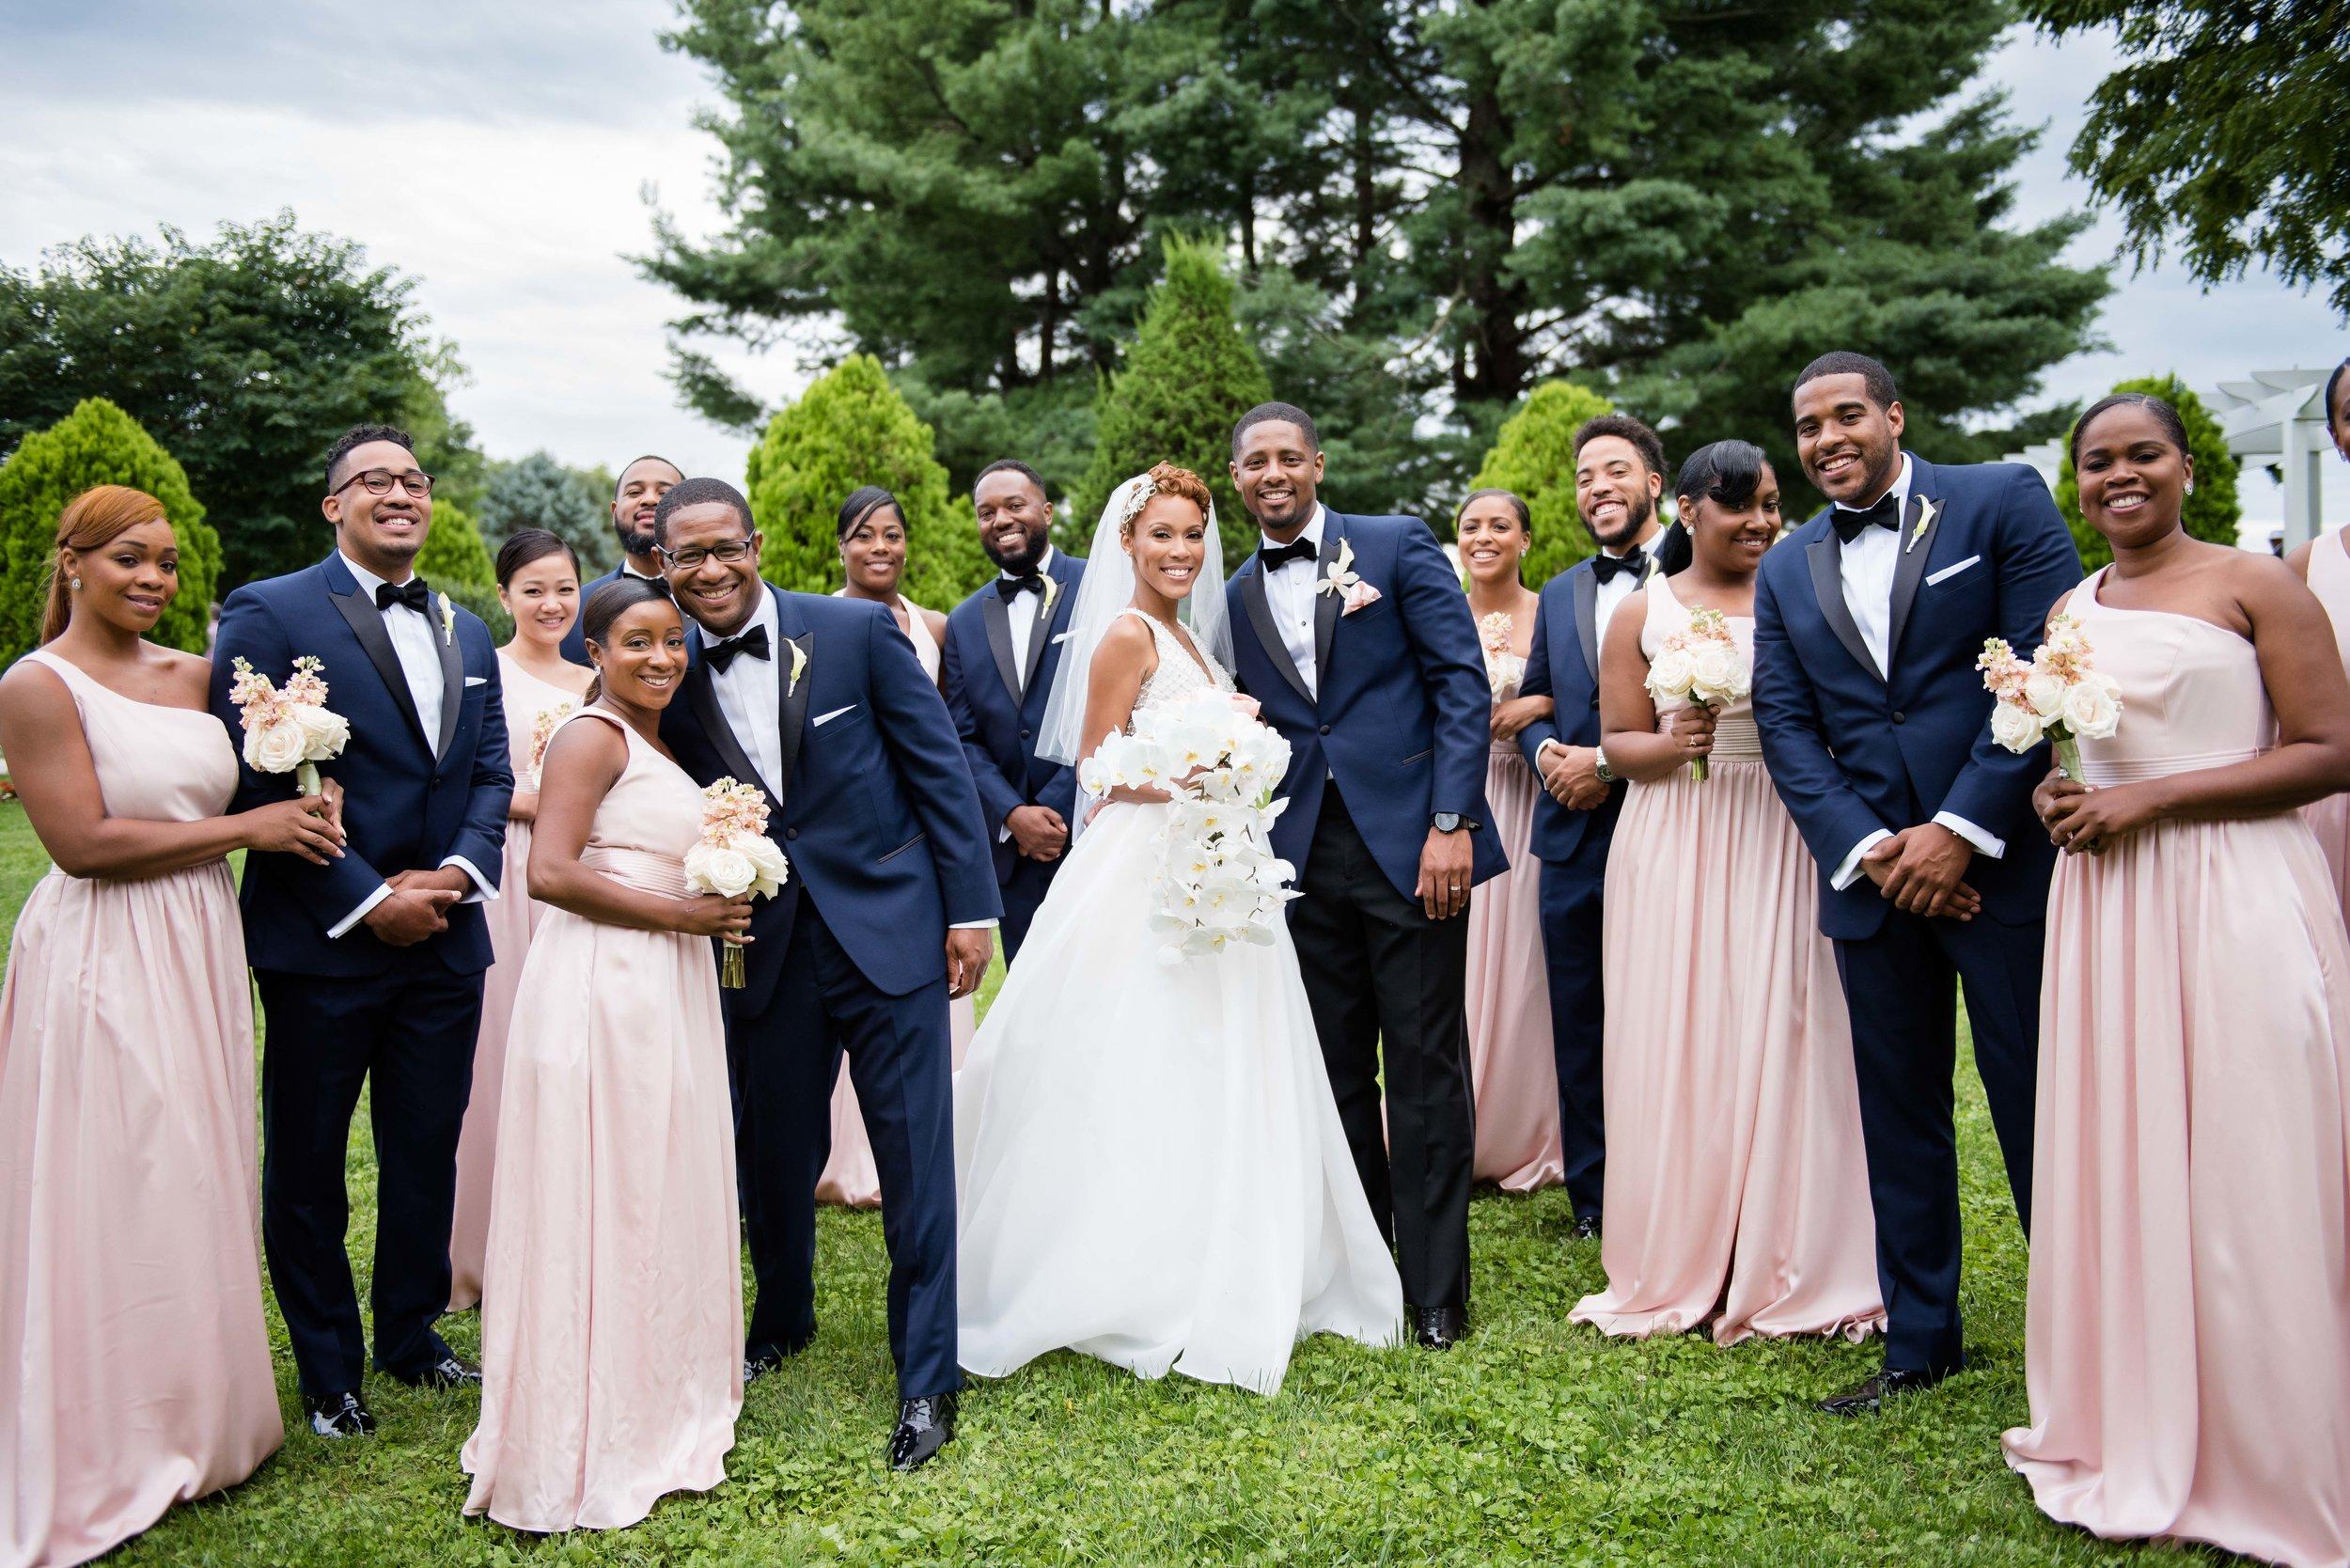 Chase Wedding - 2017-74.JPG